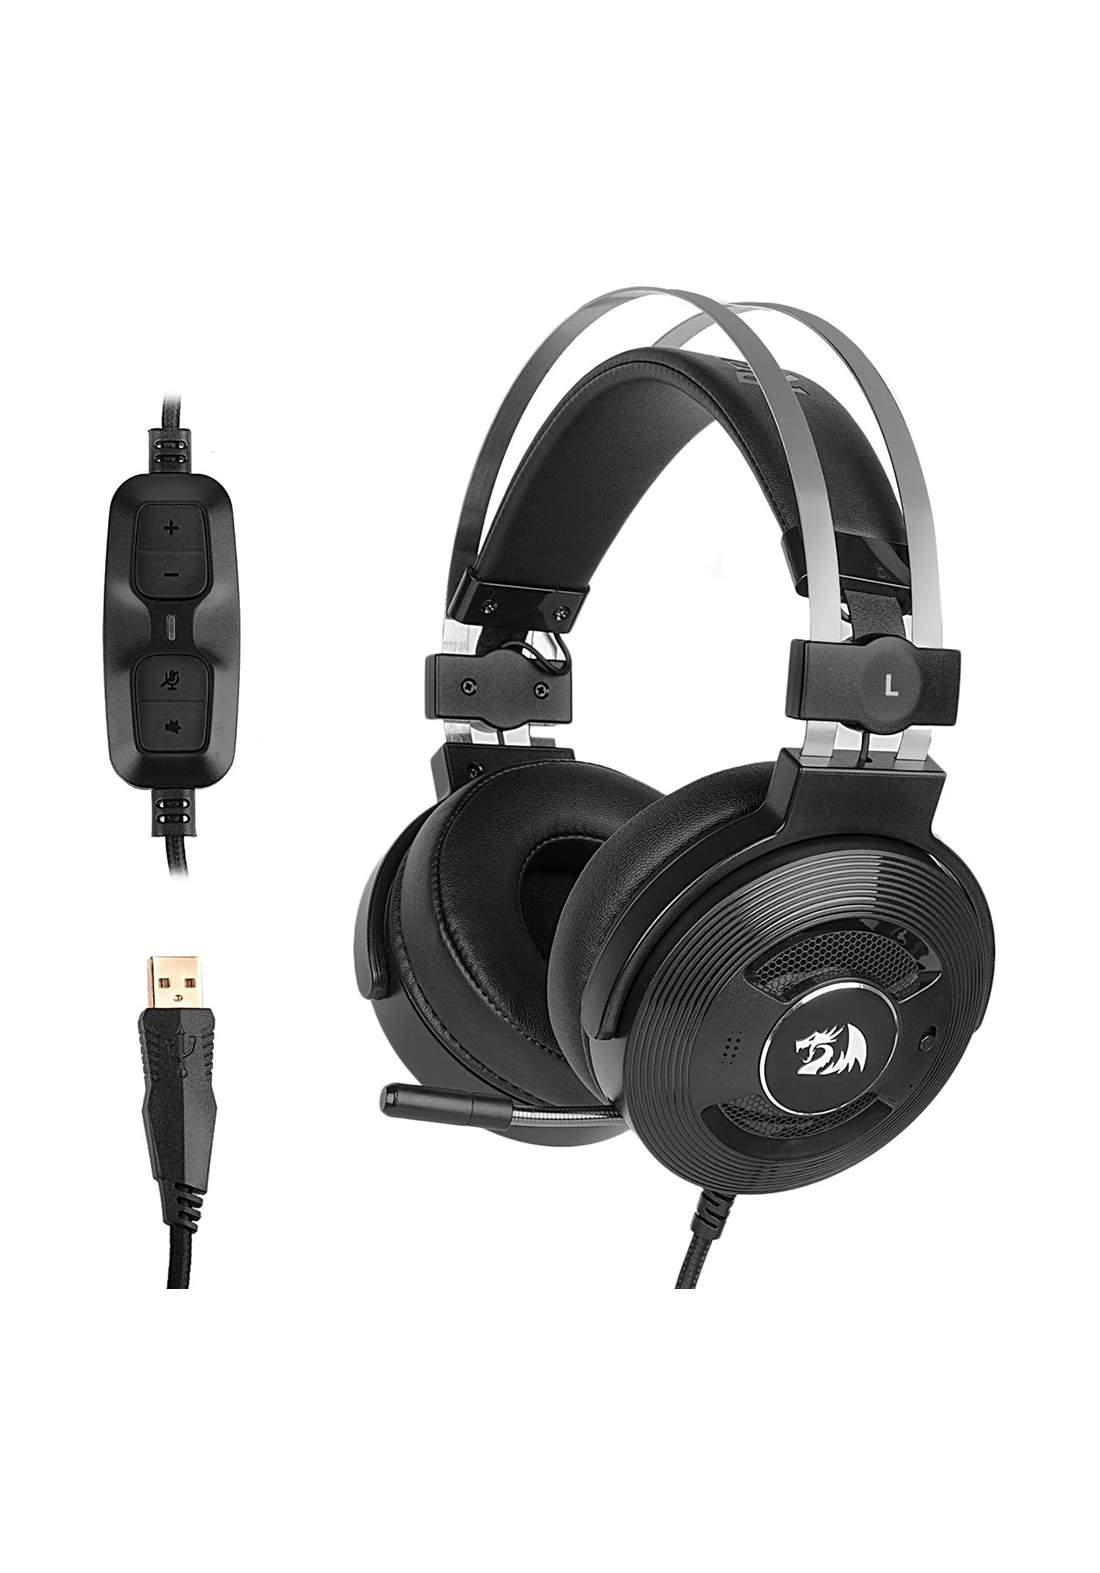 Redragon Triton 7.1 USB Wired Gaming Headphones - Black سماعة